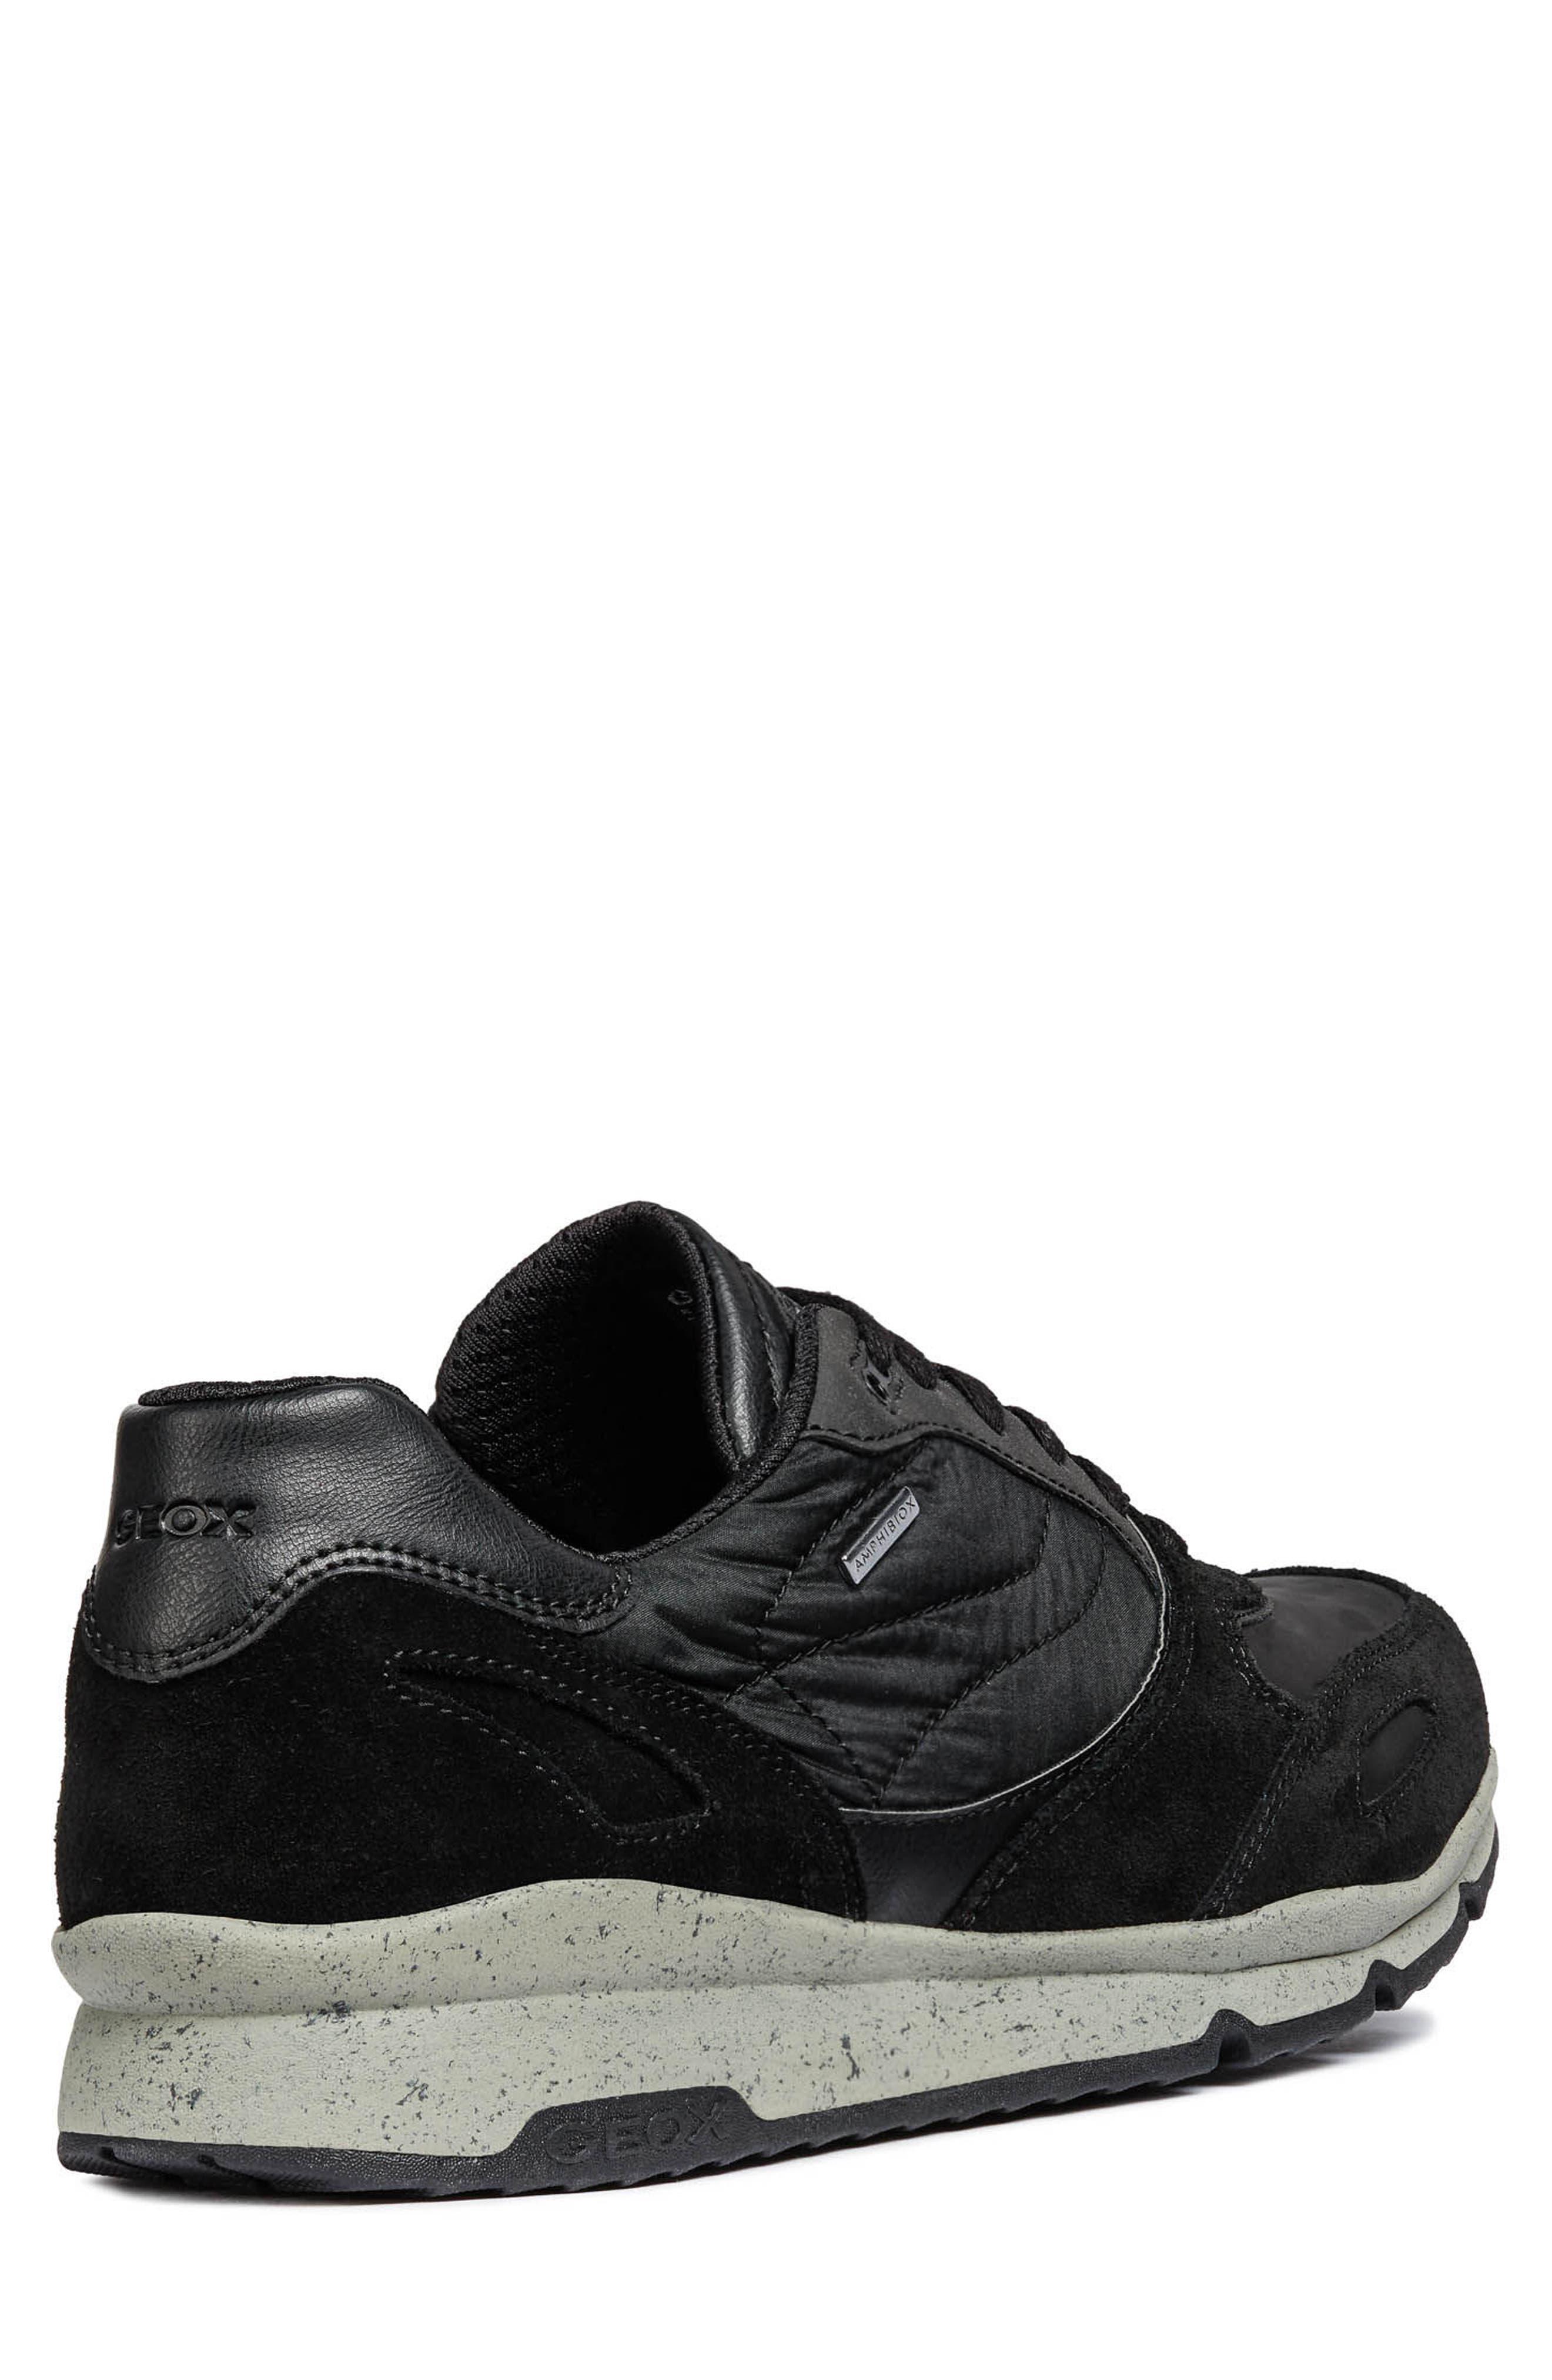 Sandro ABX Ambphibiox Waterproof Sneaker,                             Alternate thumbnail 2, color,                             007